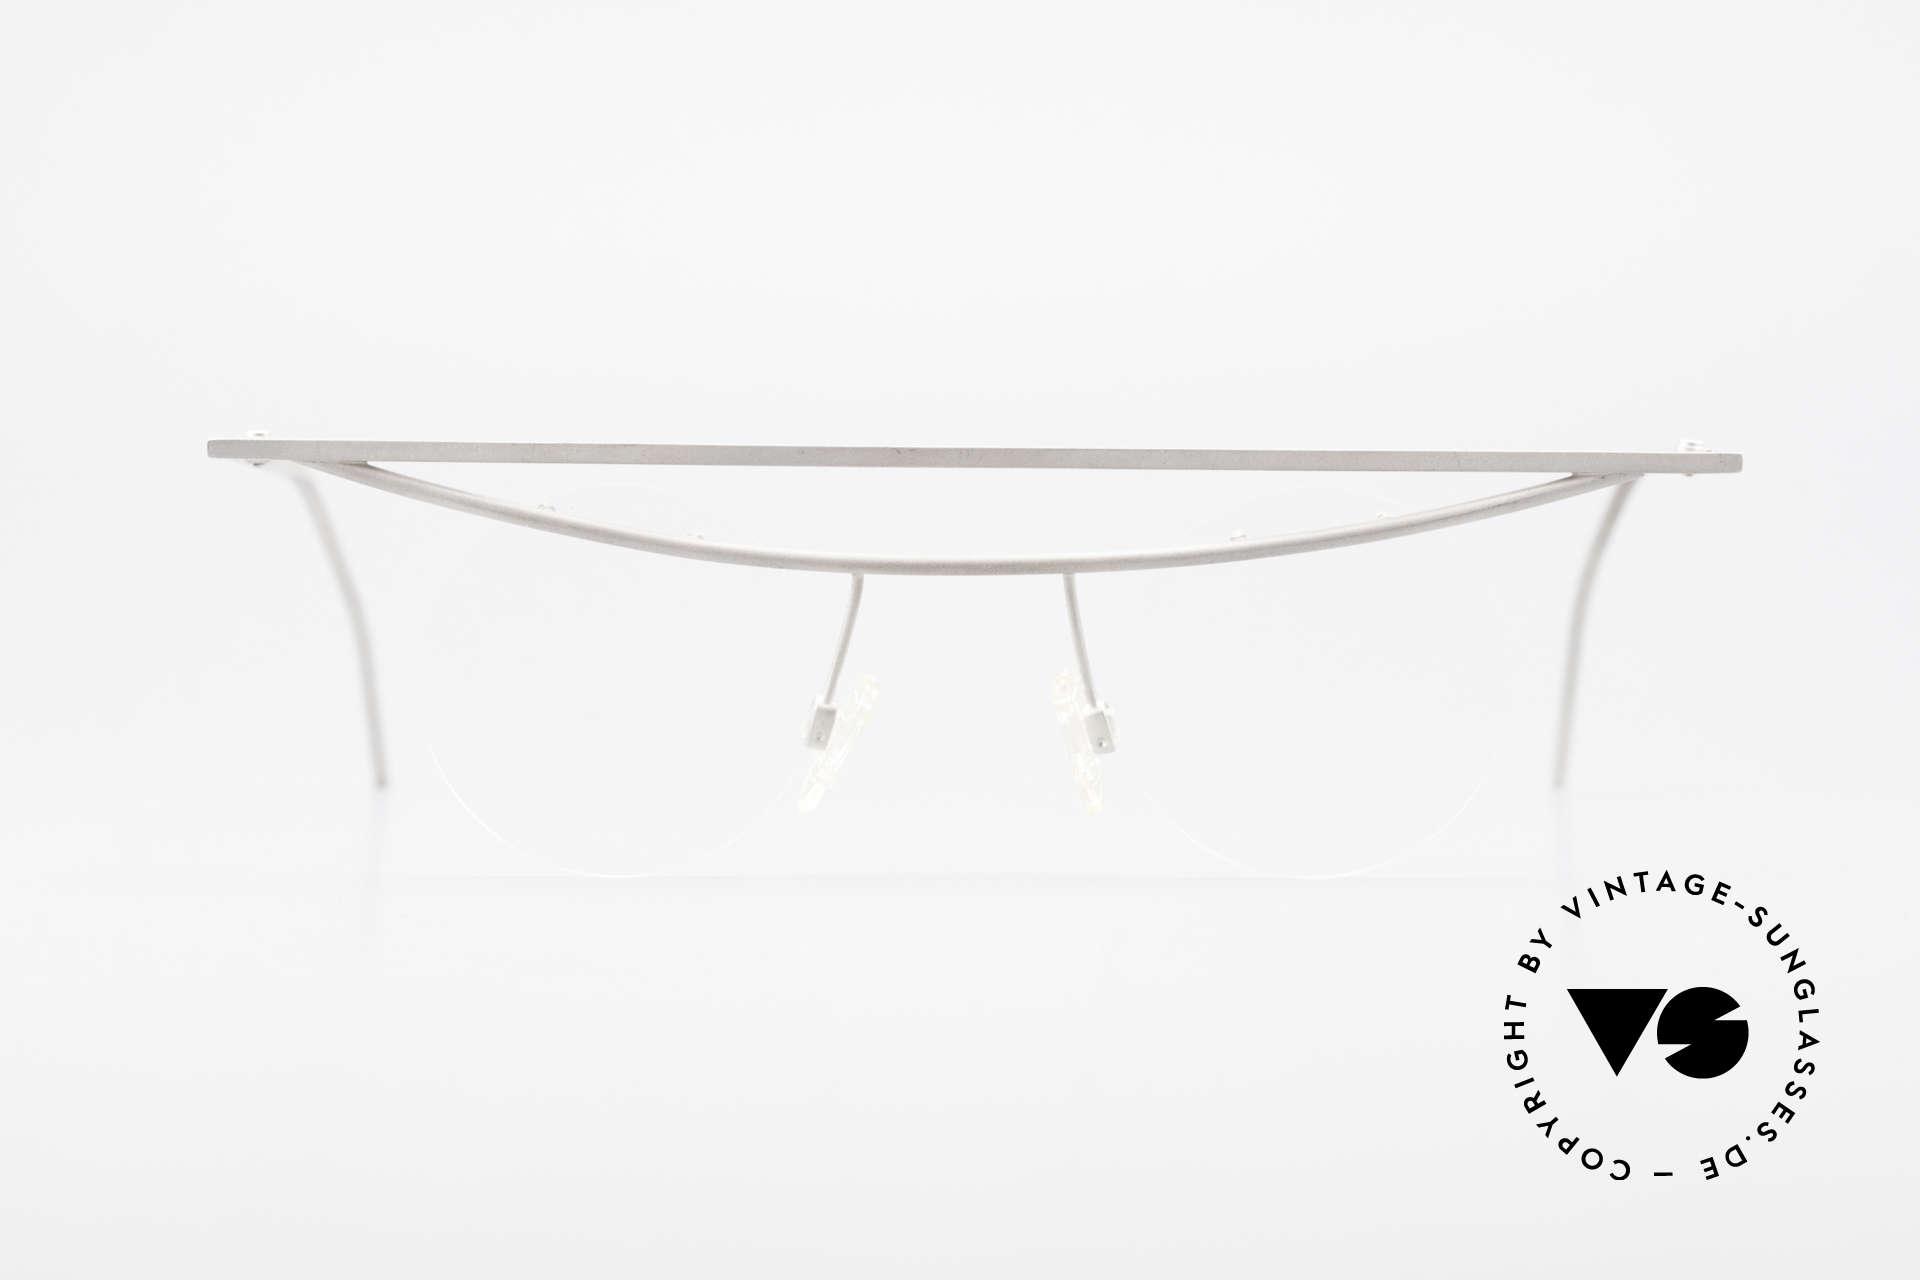 B. Angeletti Cesna Vintage Architect's Glasses XL, designer frame (inspired by architect Marcel Breuer), Made for Men and Women